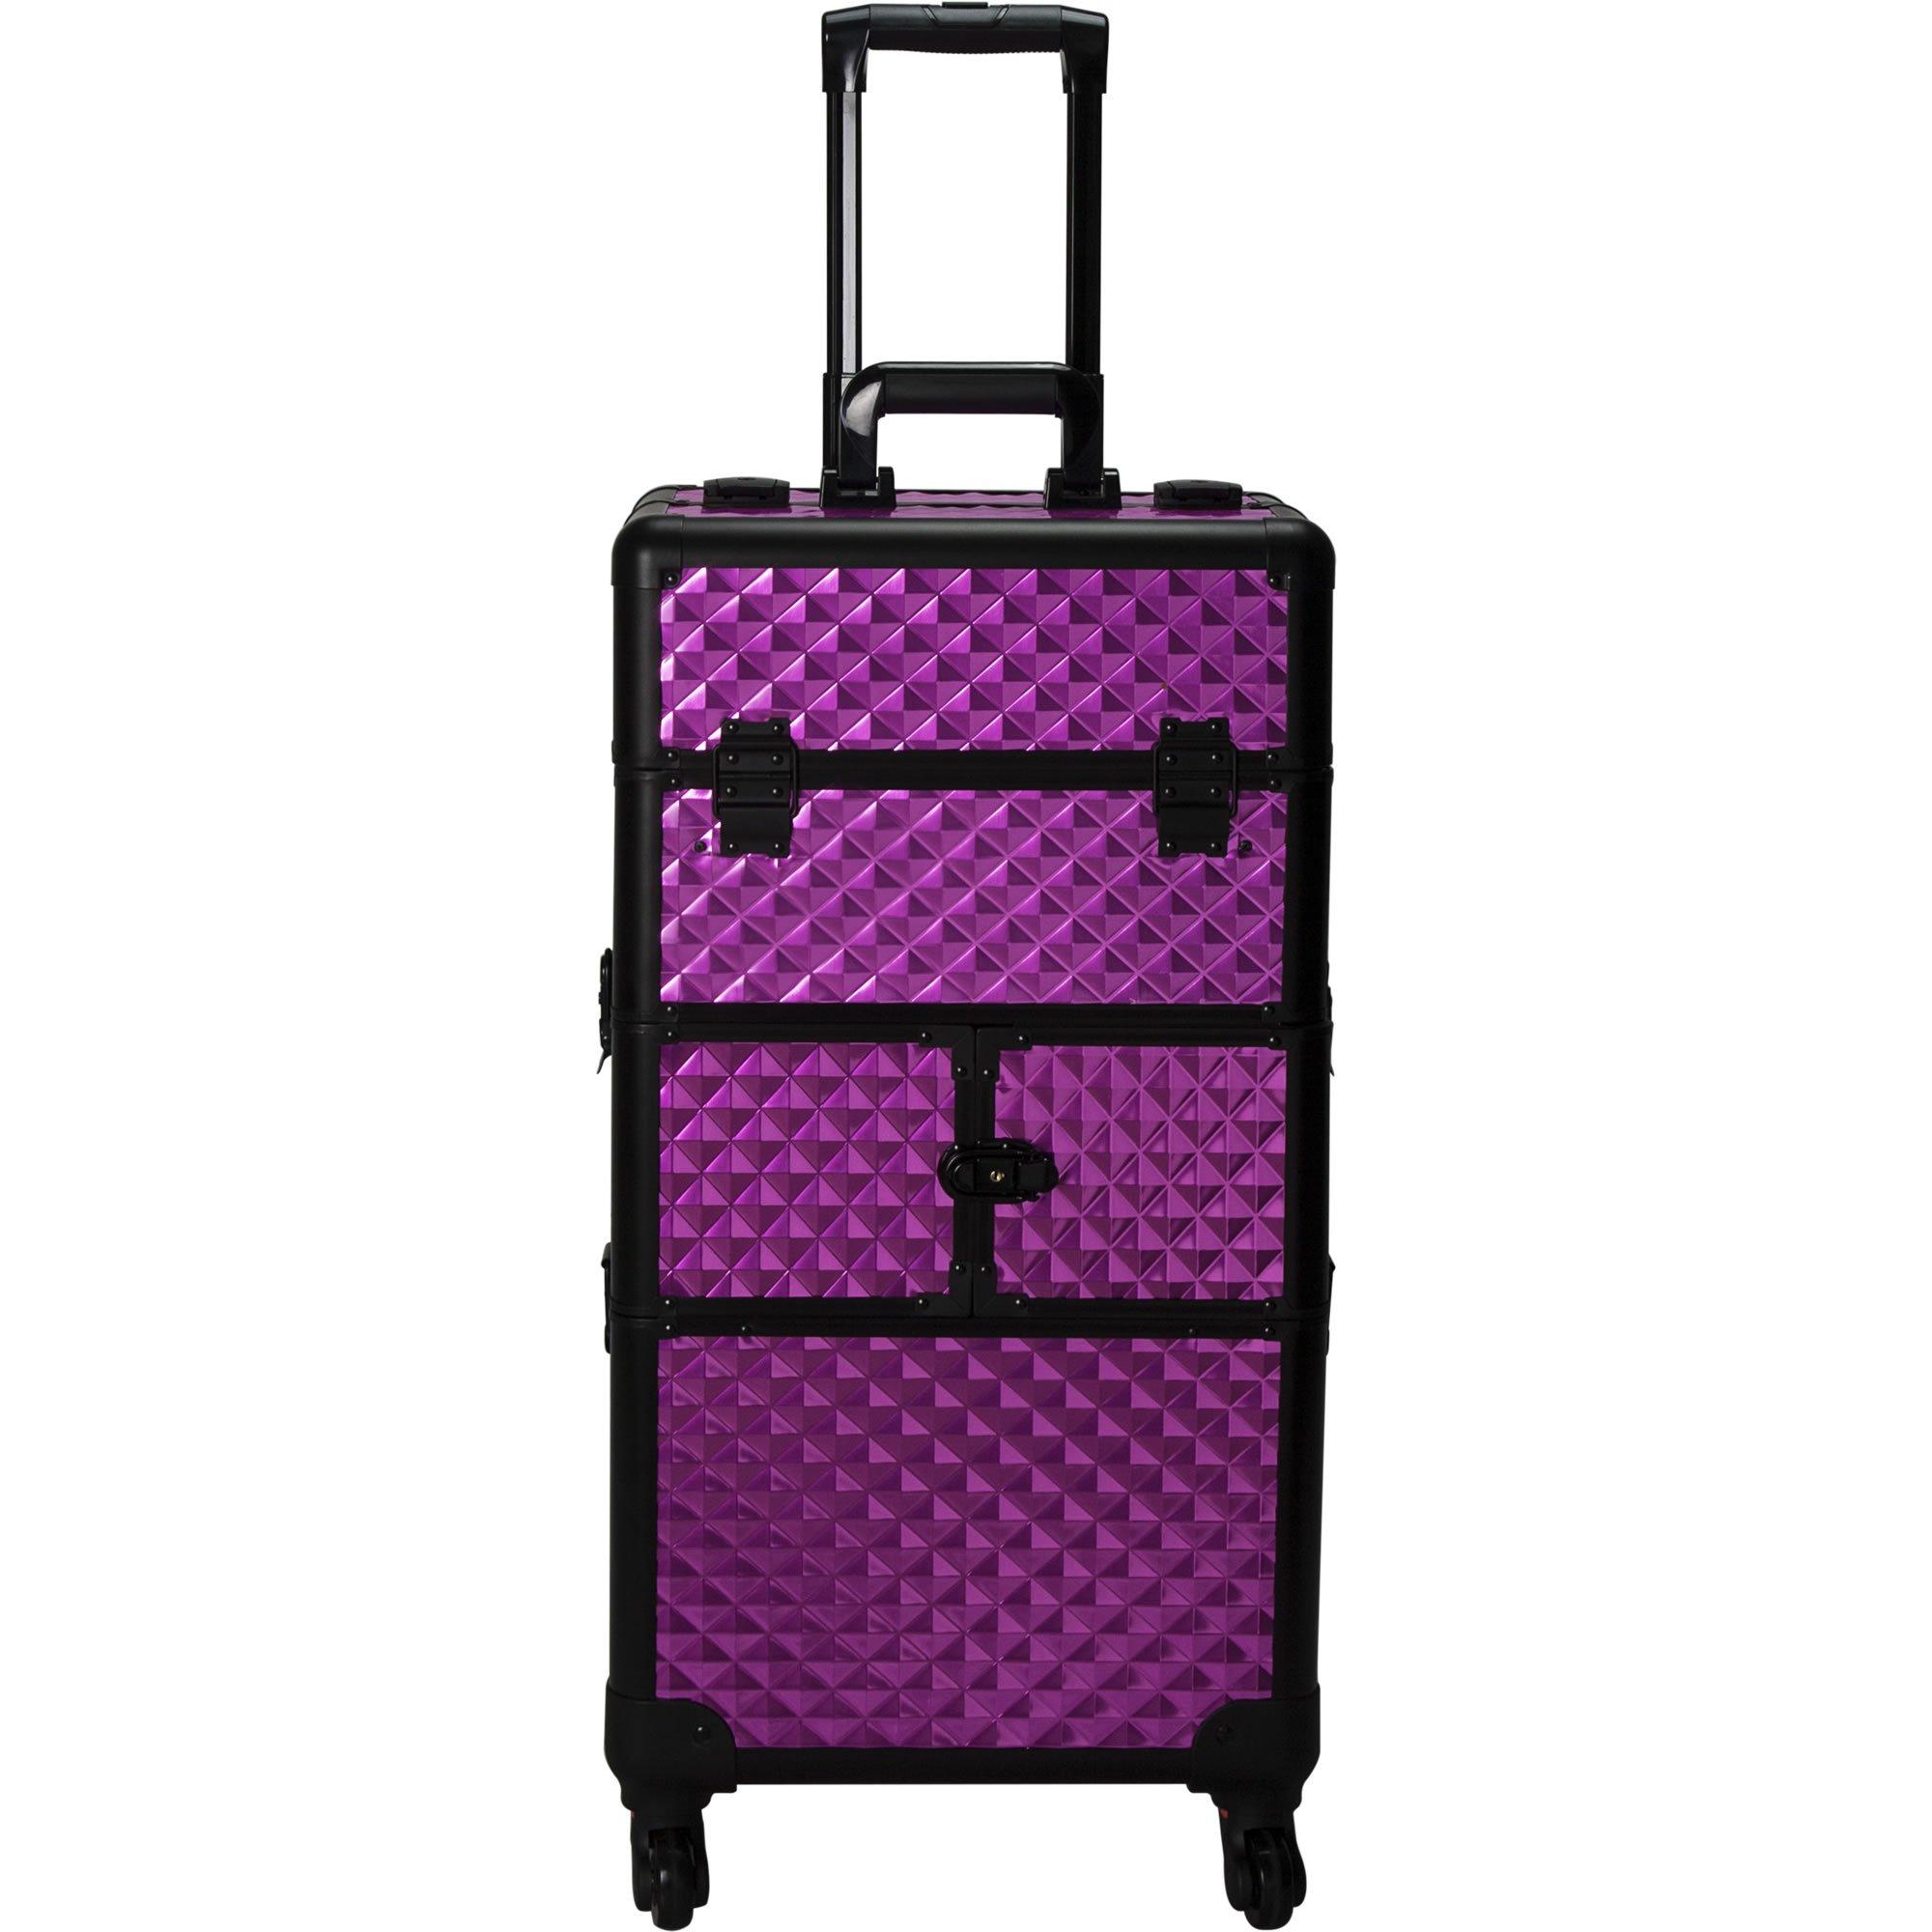 SUNRISE Hair Stylist Case I3164 Makeup Train Organizer, 4 Wheel Spinner, 10 Slide Trays, Locking with Mirror and Shoulder Strap, Purple Diamond